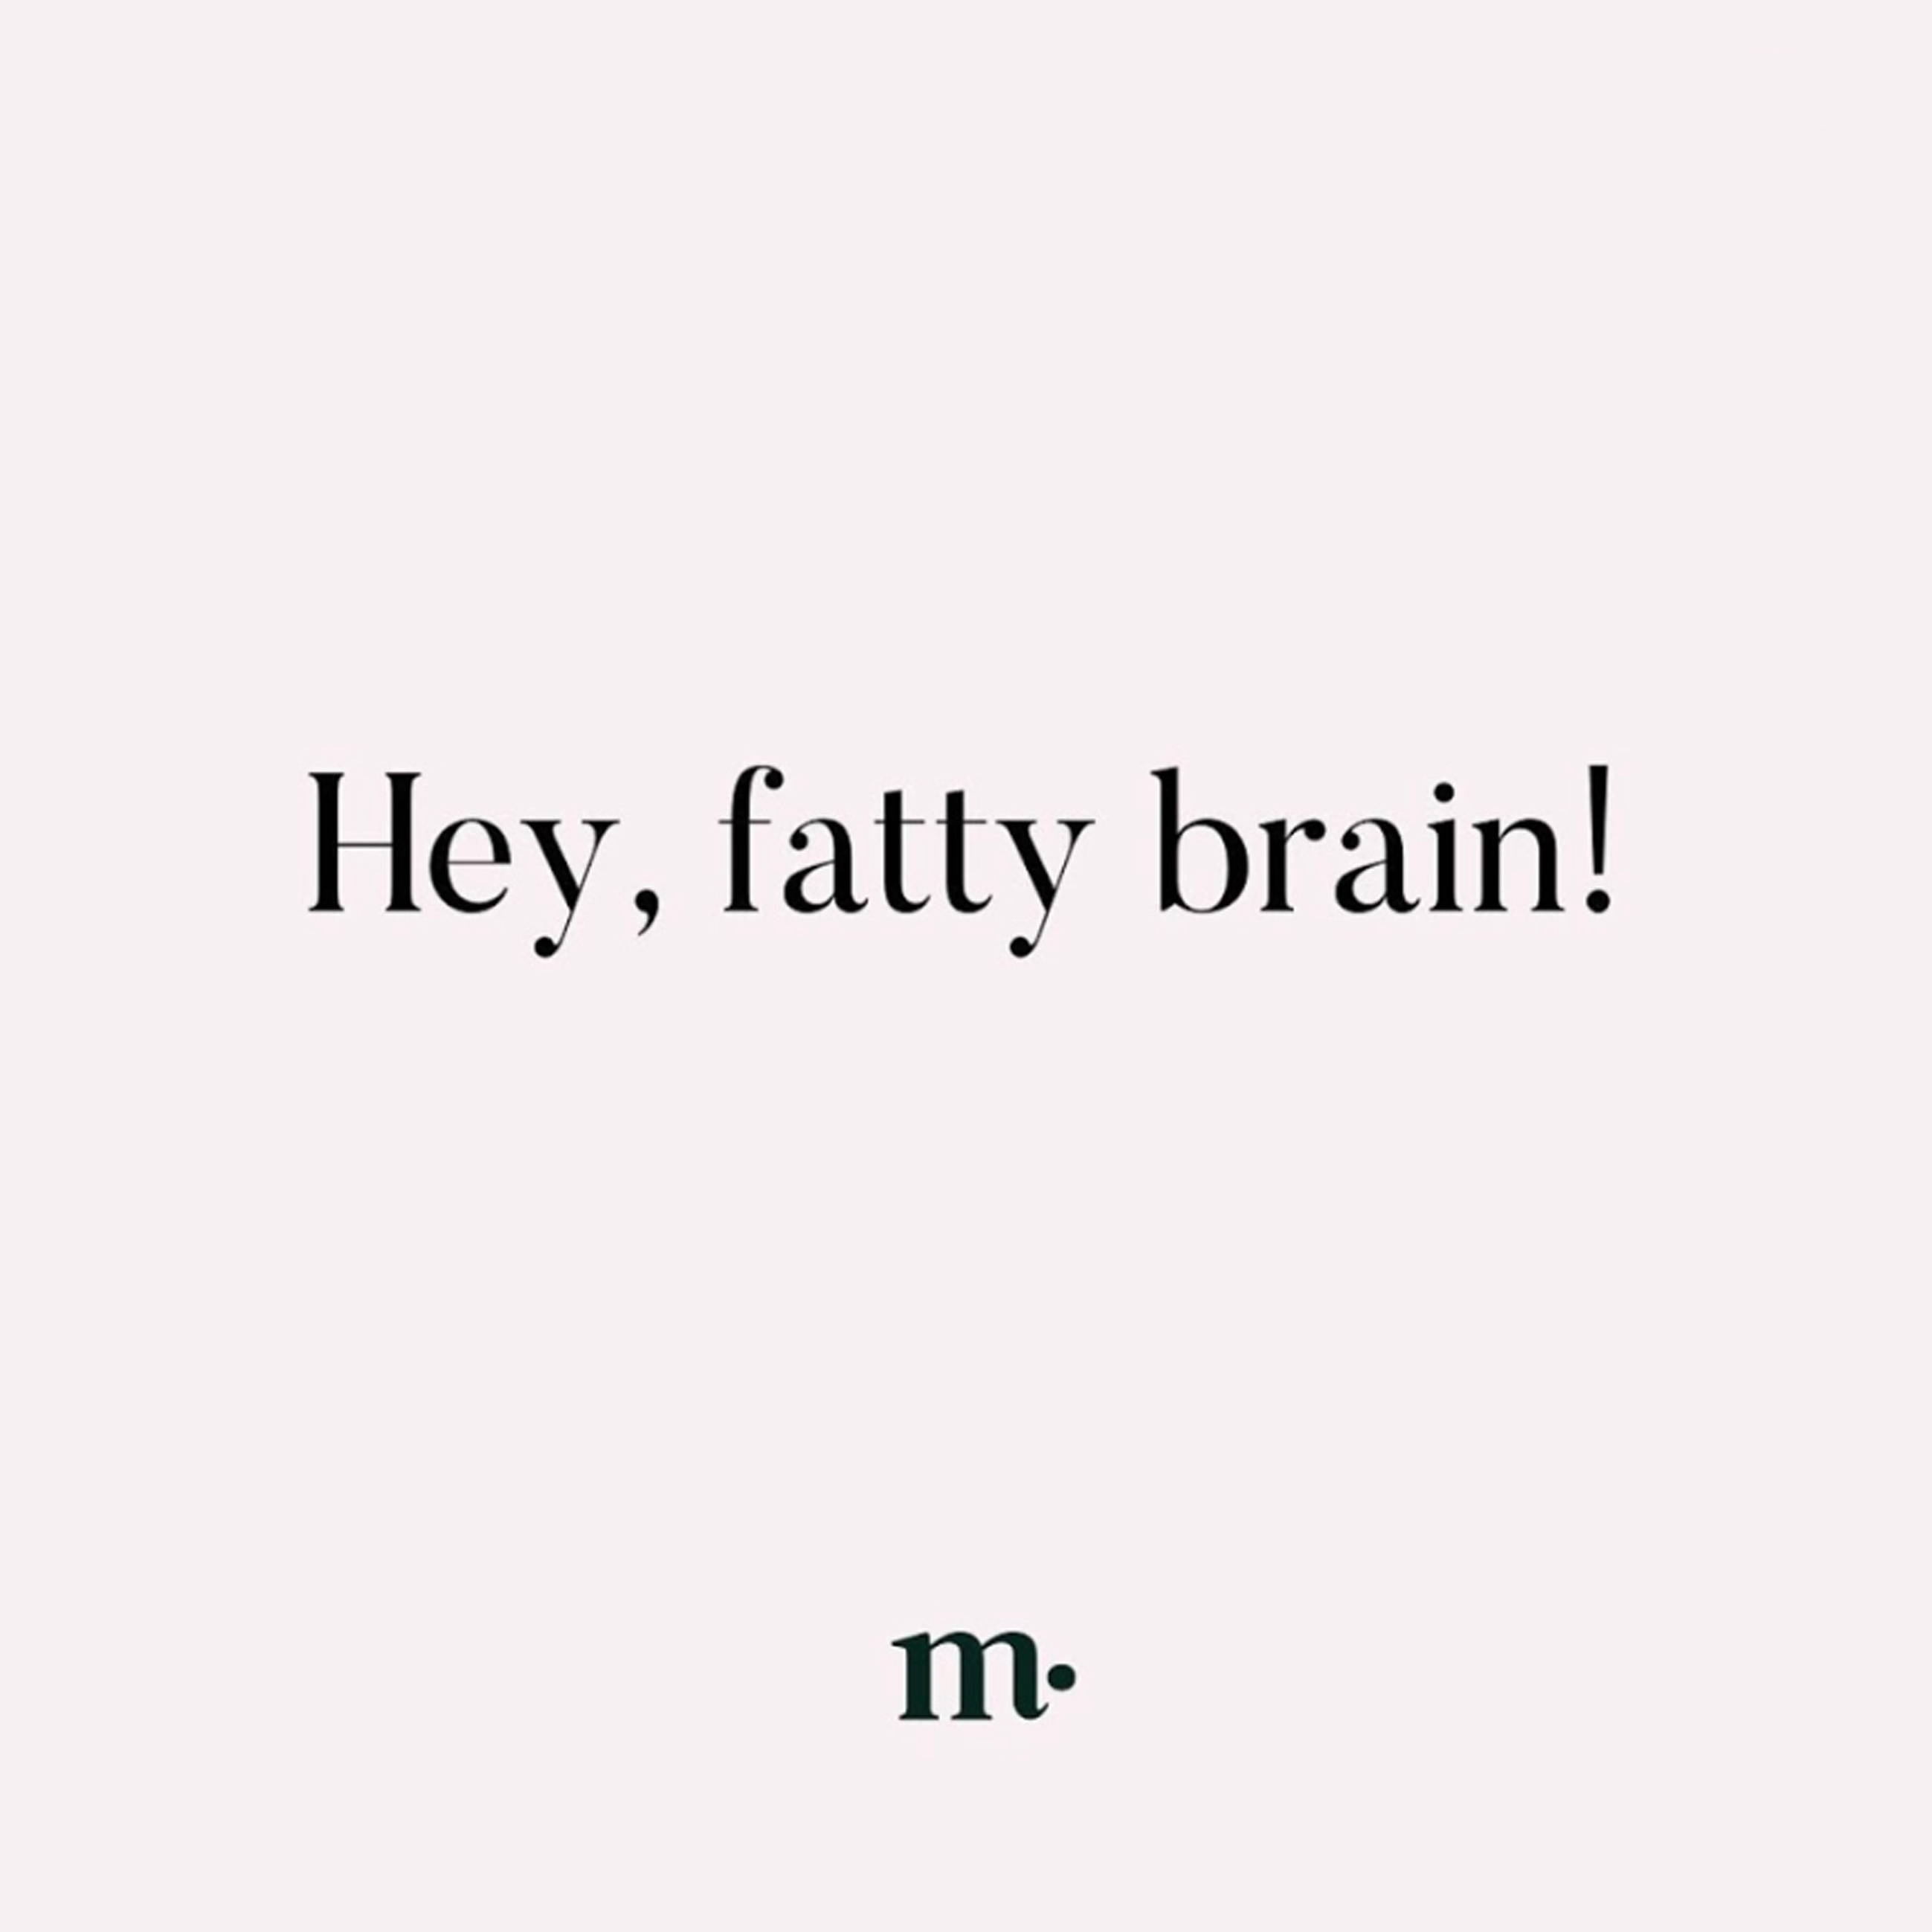 heym fatty brain